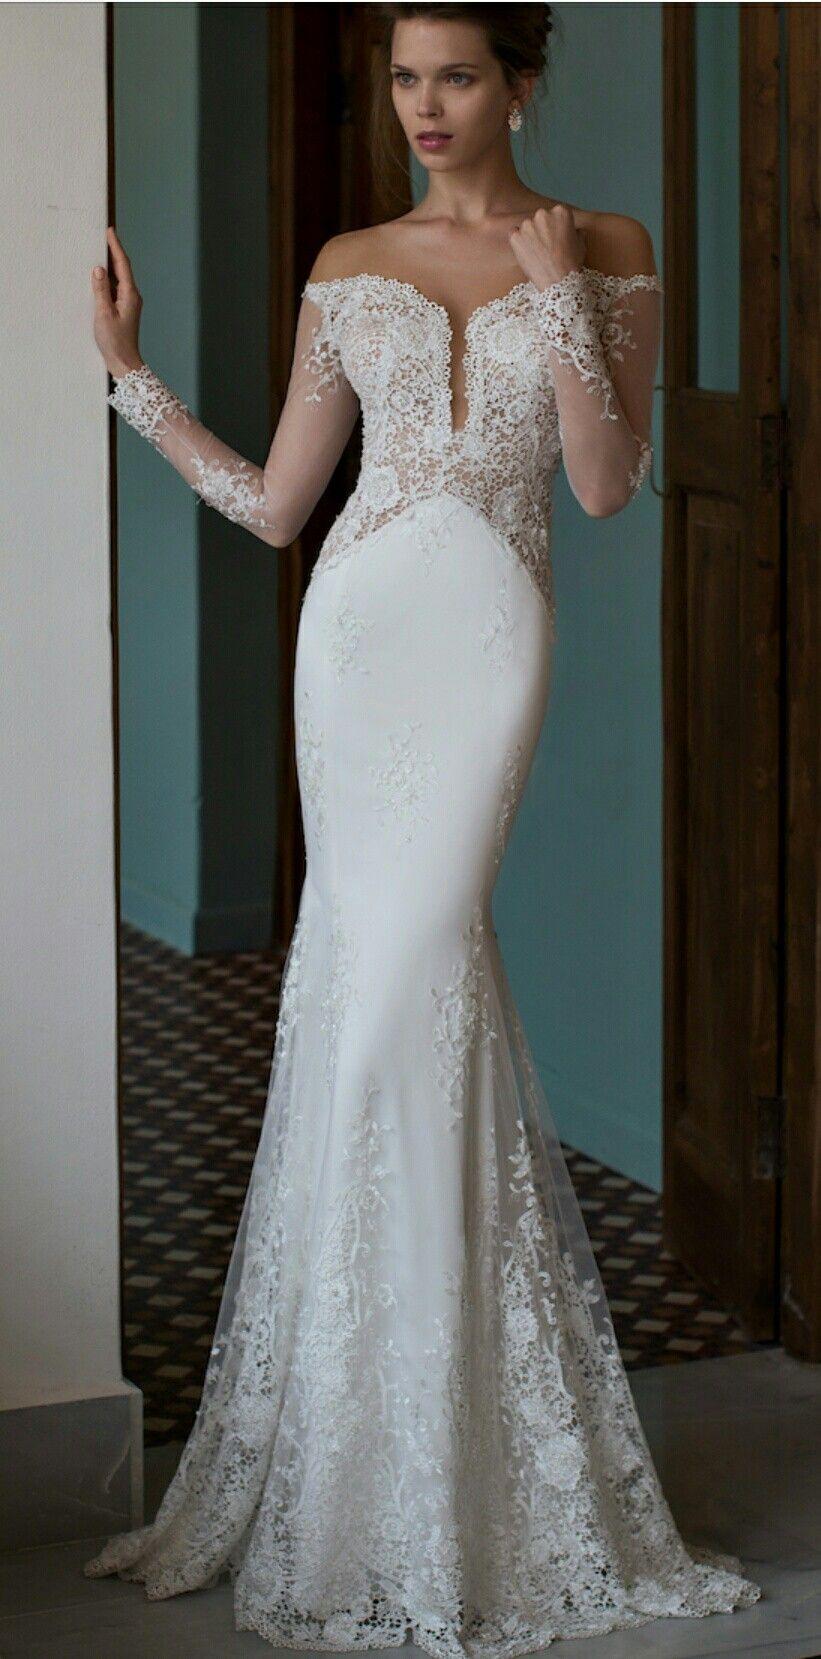 Riki Dalal Sheer Wedding Dress Wedding Dress Long Sleeve Informal Wedding Dresses [ 1659 x 821 Pixel ]